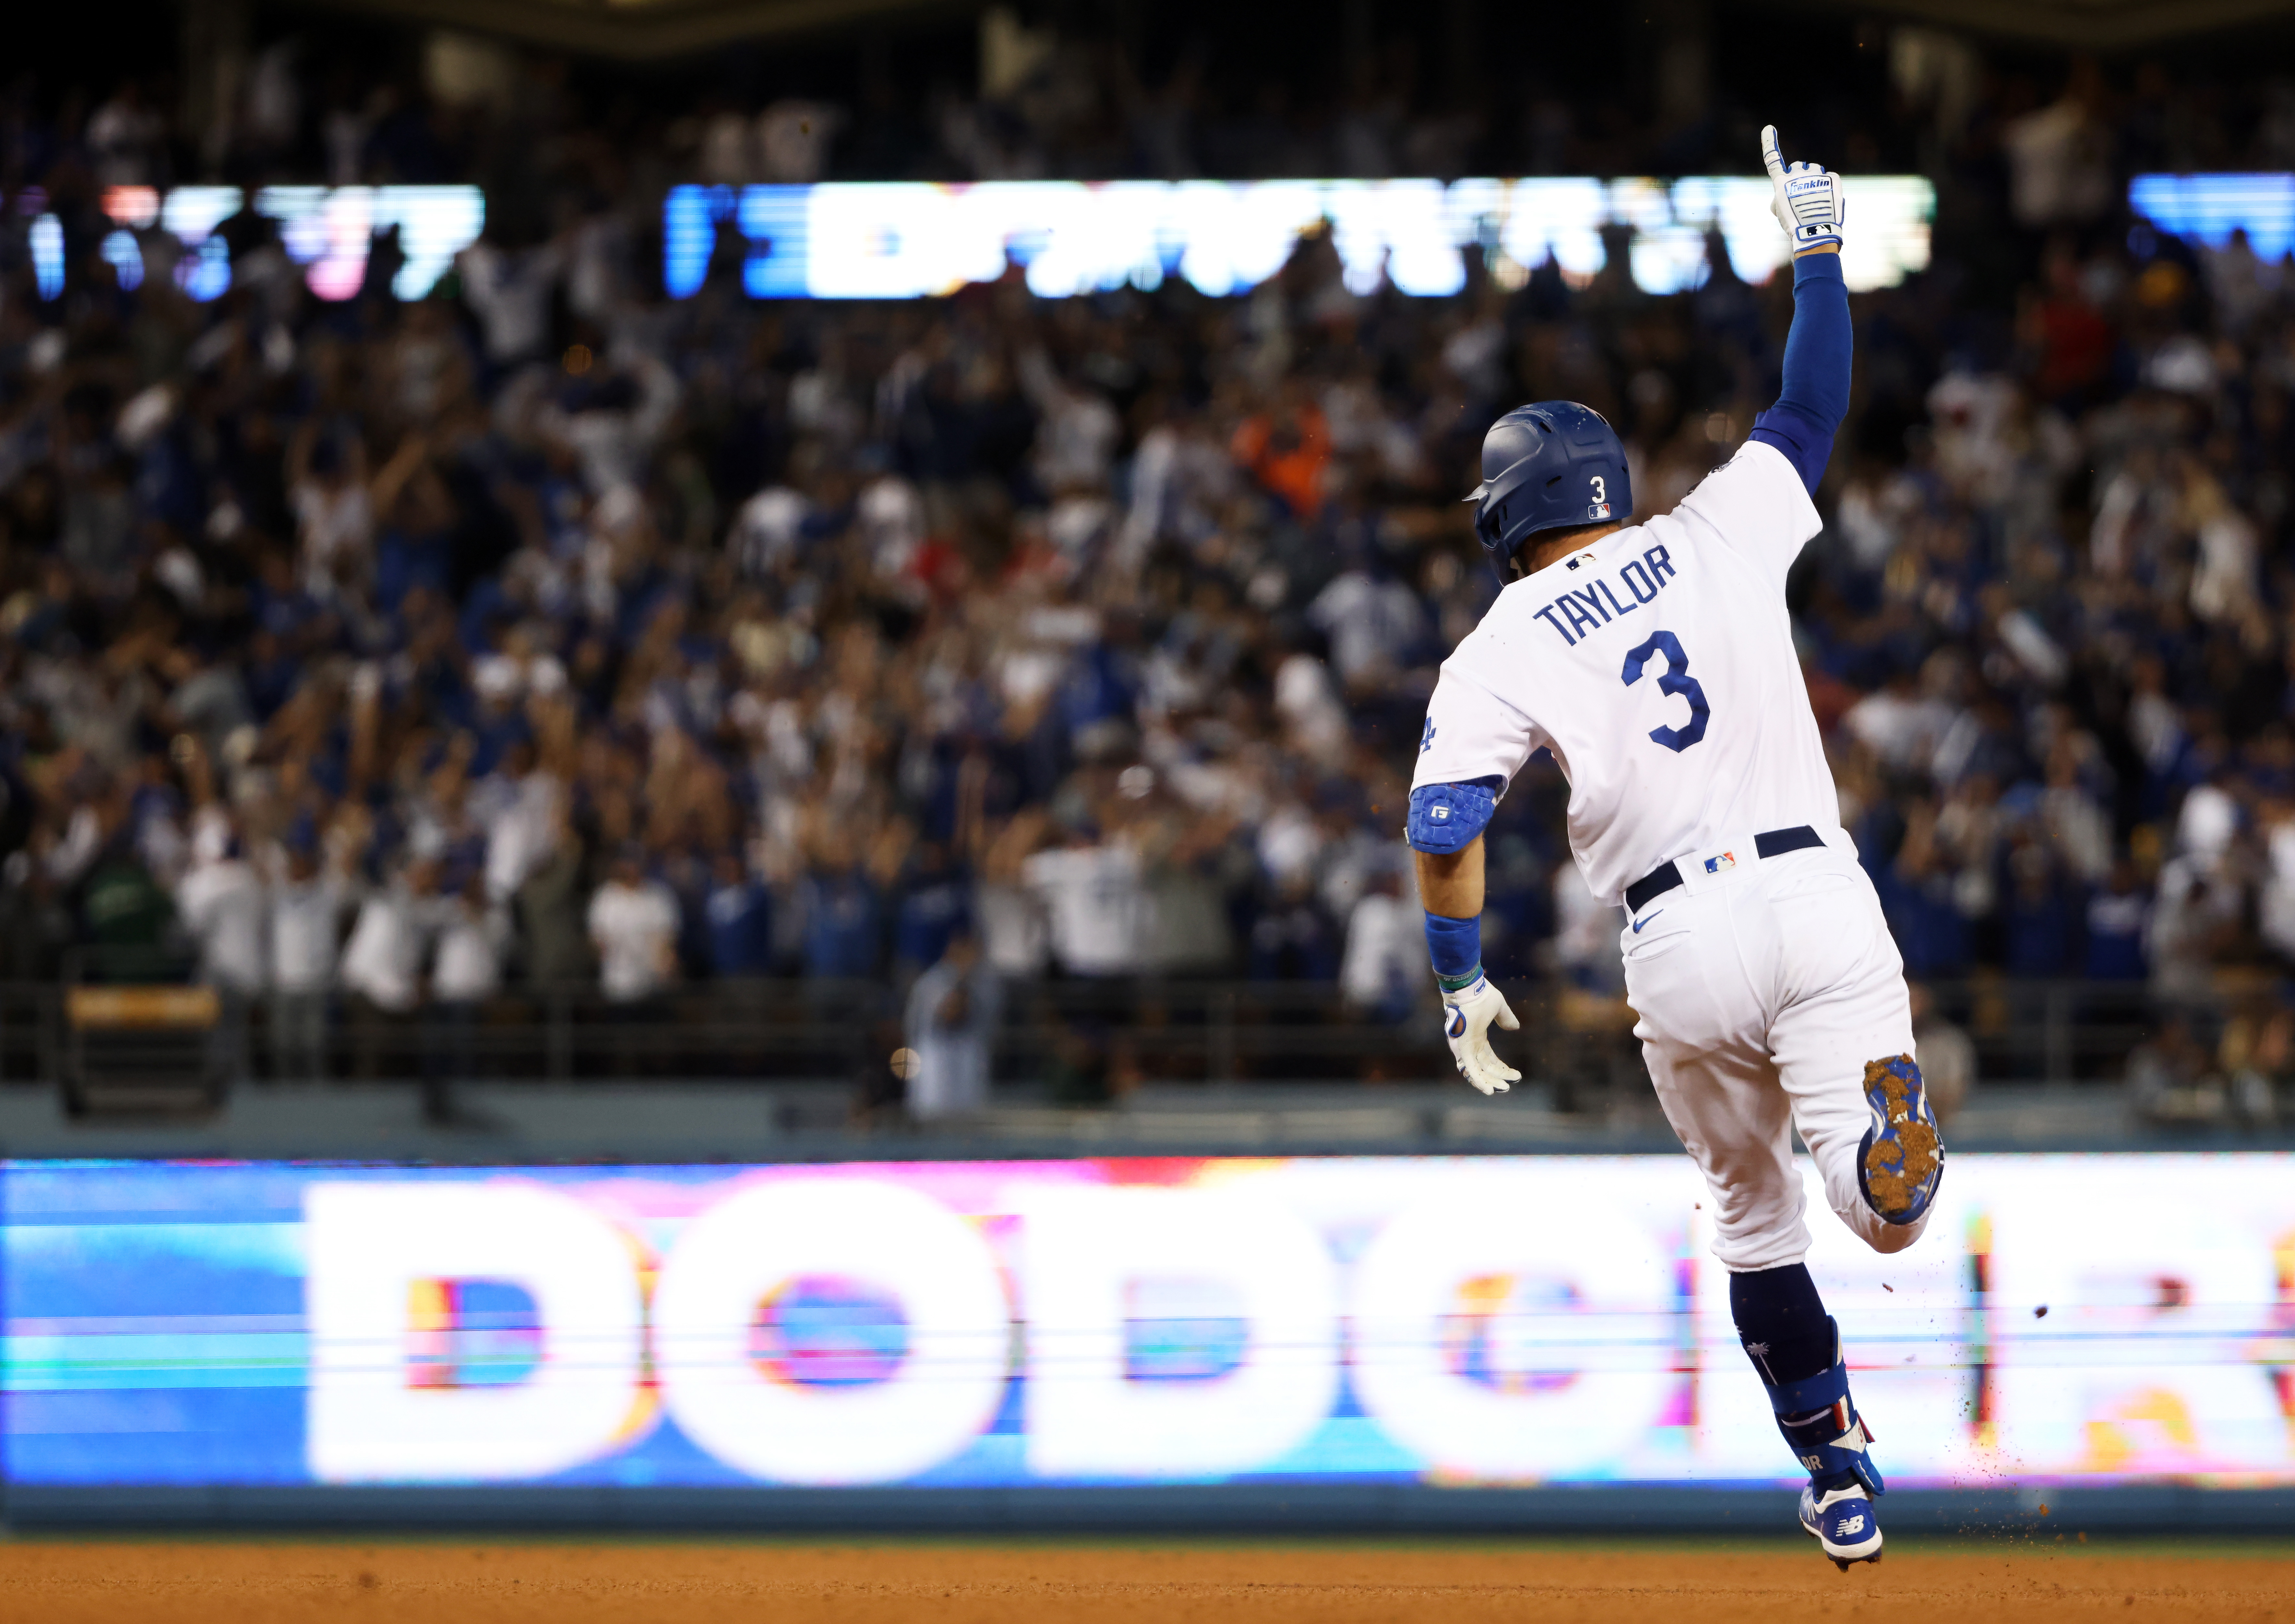 Wild Card Round - St. Louis Cardinals v Los Angeles Dodgers